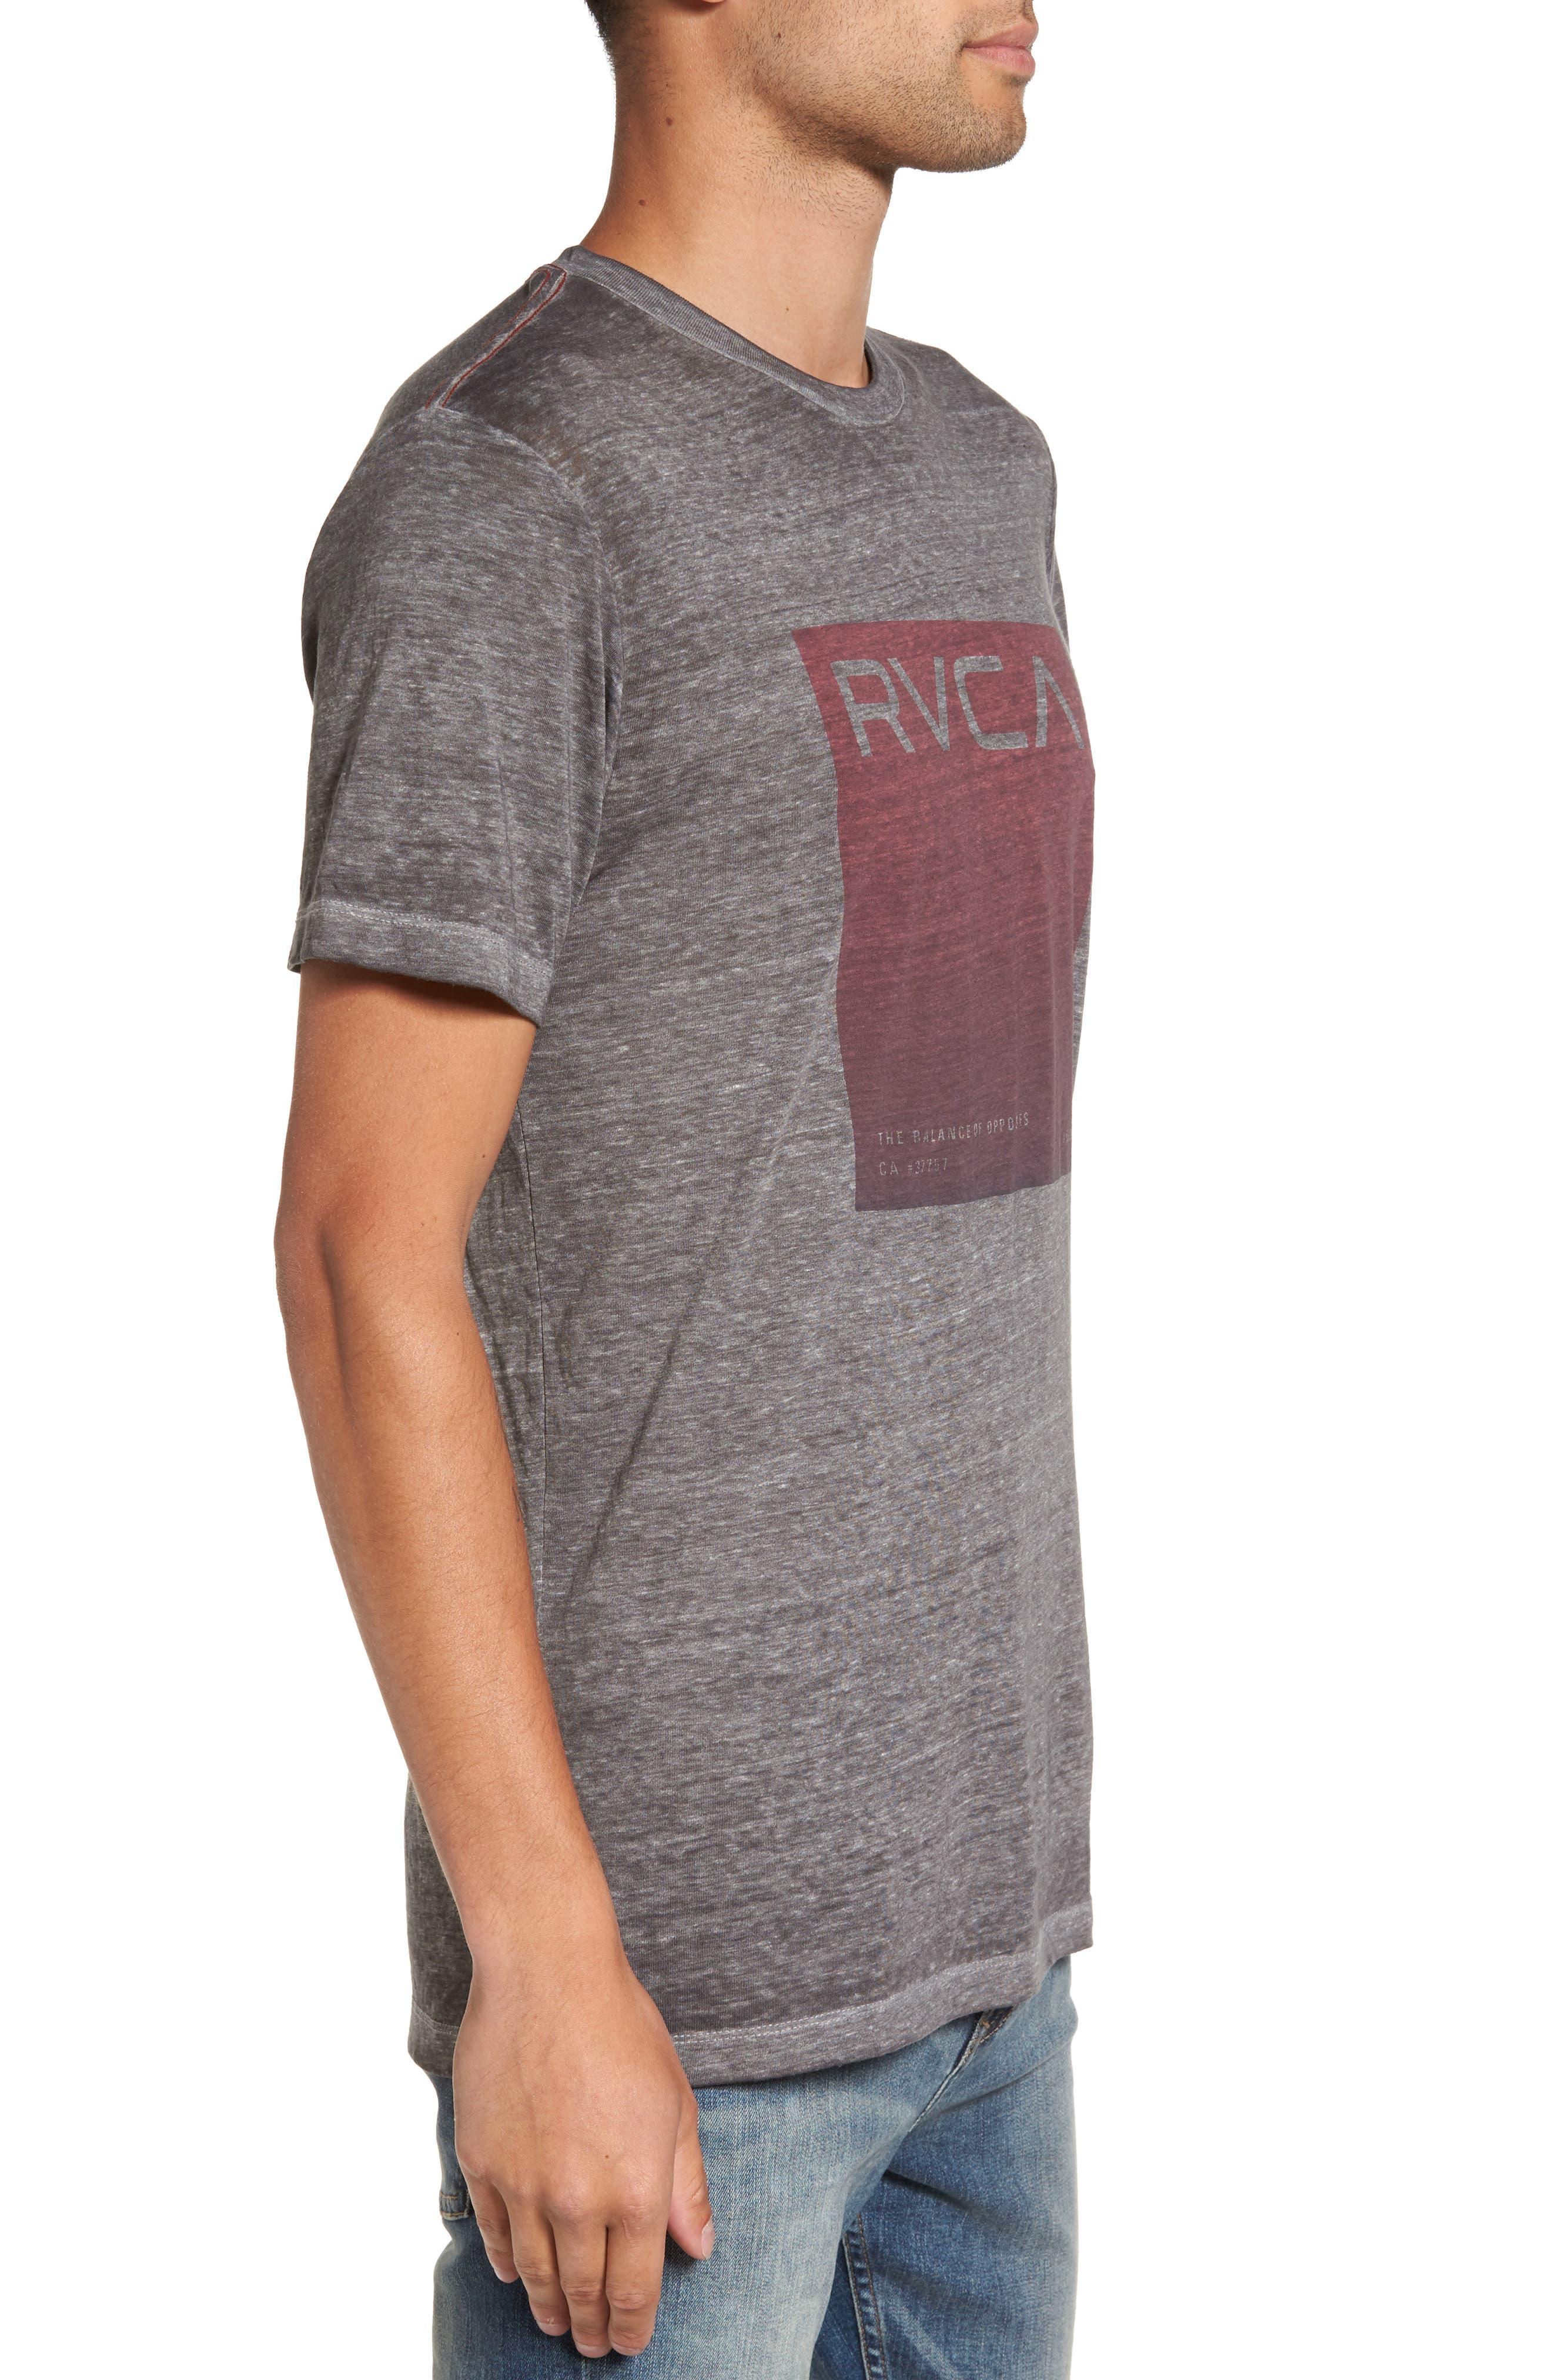 Balance Process T-Shirt,                             Alternate thumbnail 3, color,                             051